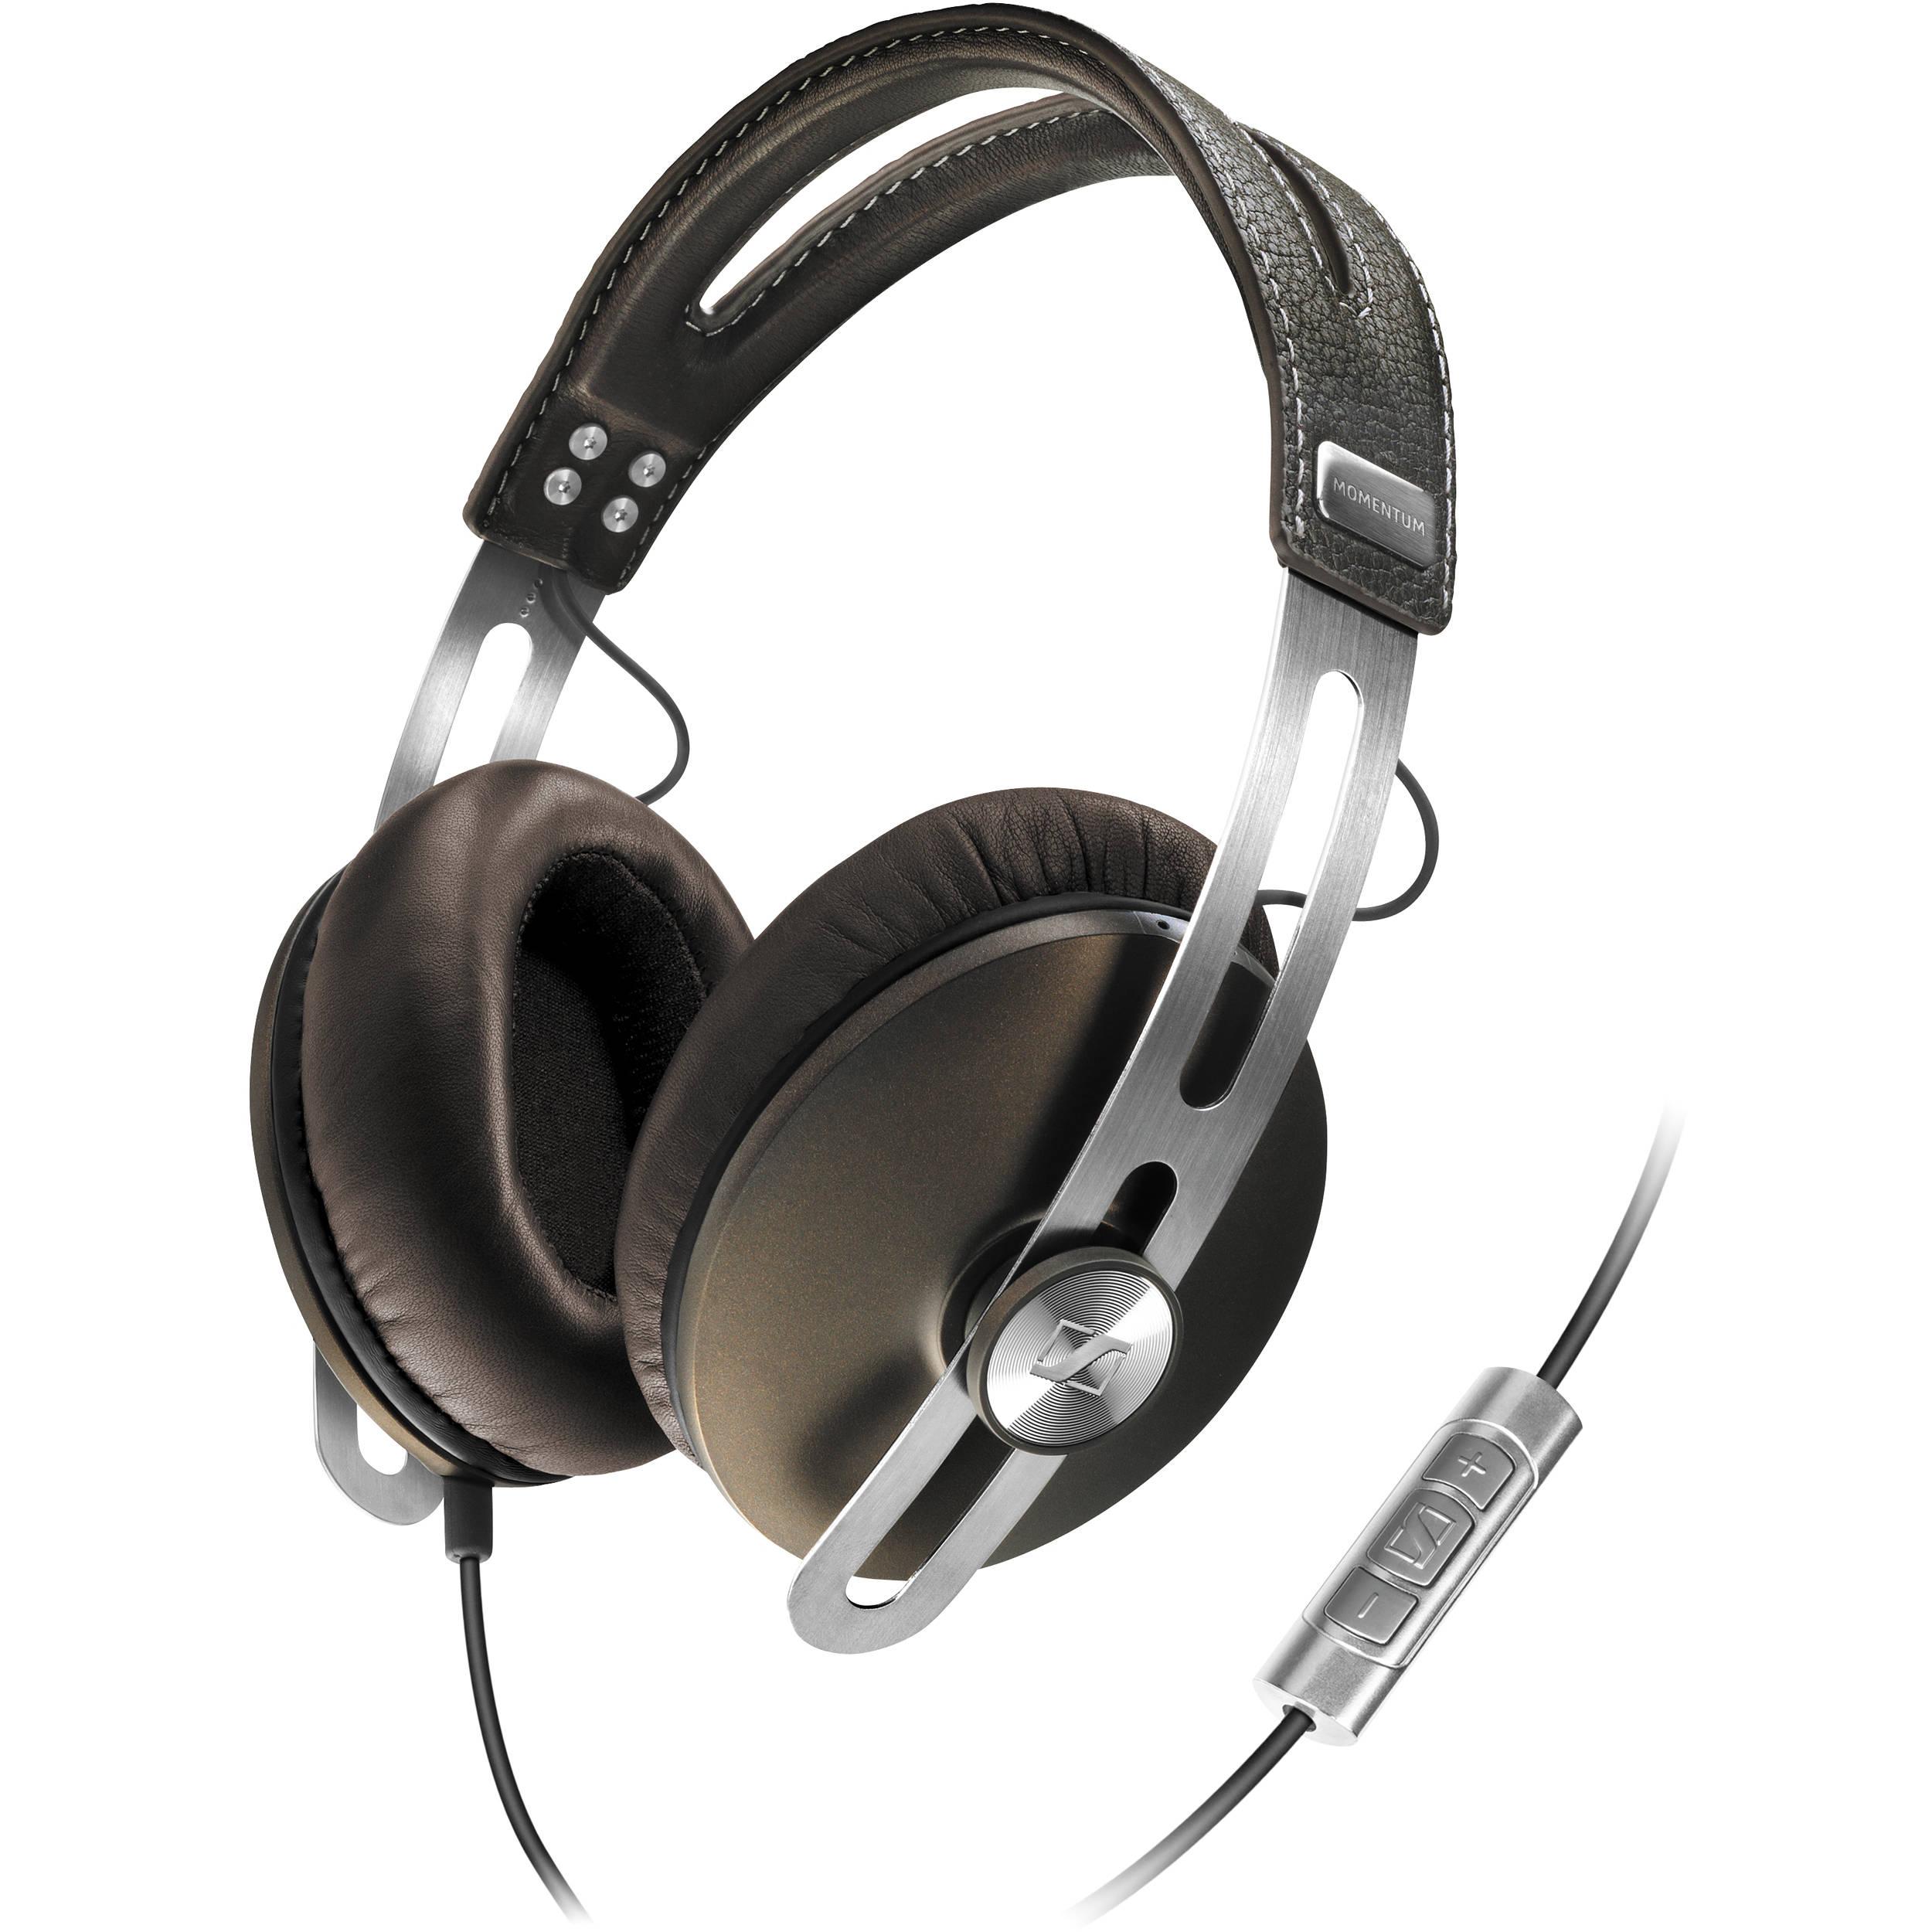 Sennheiser Momentum Headphones Brown 505630 Bh Photo Video In Ear I